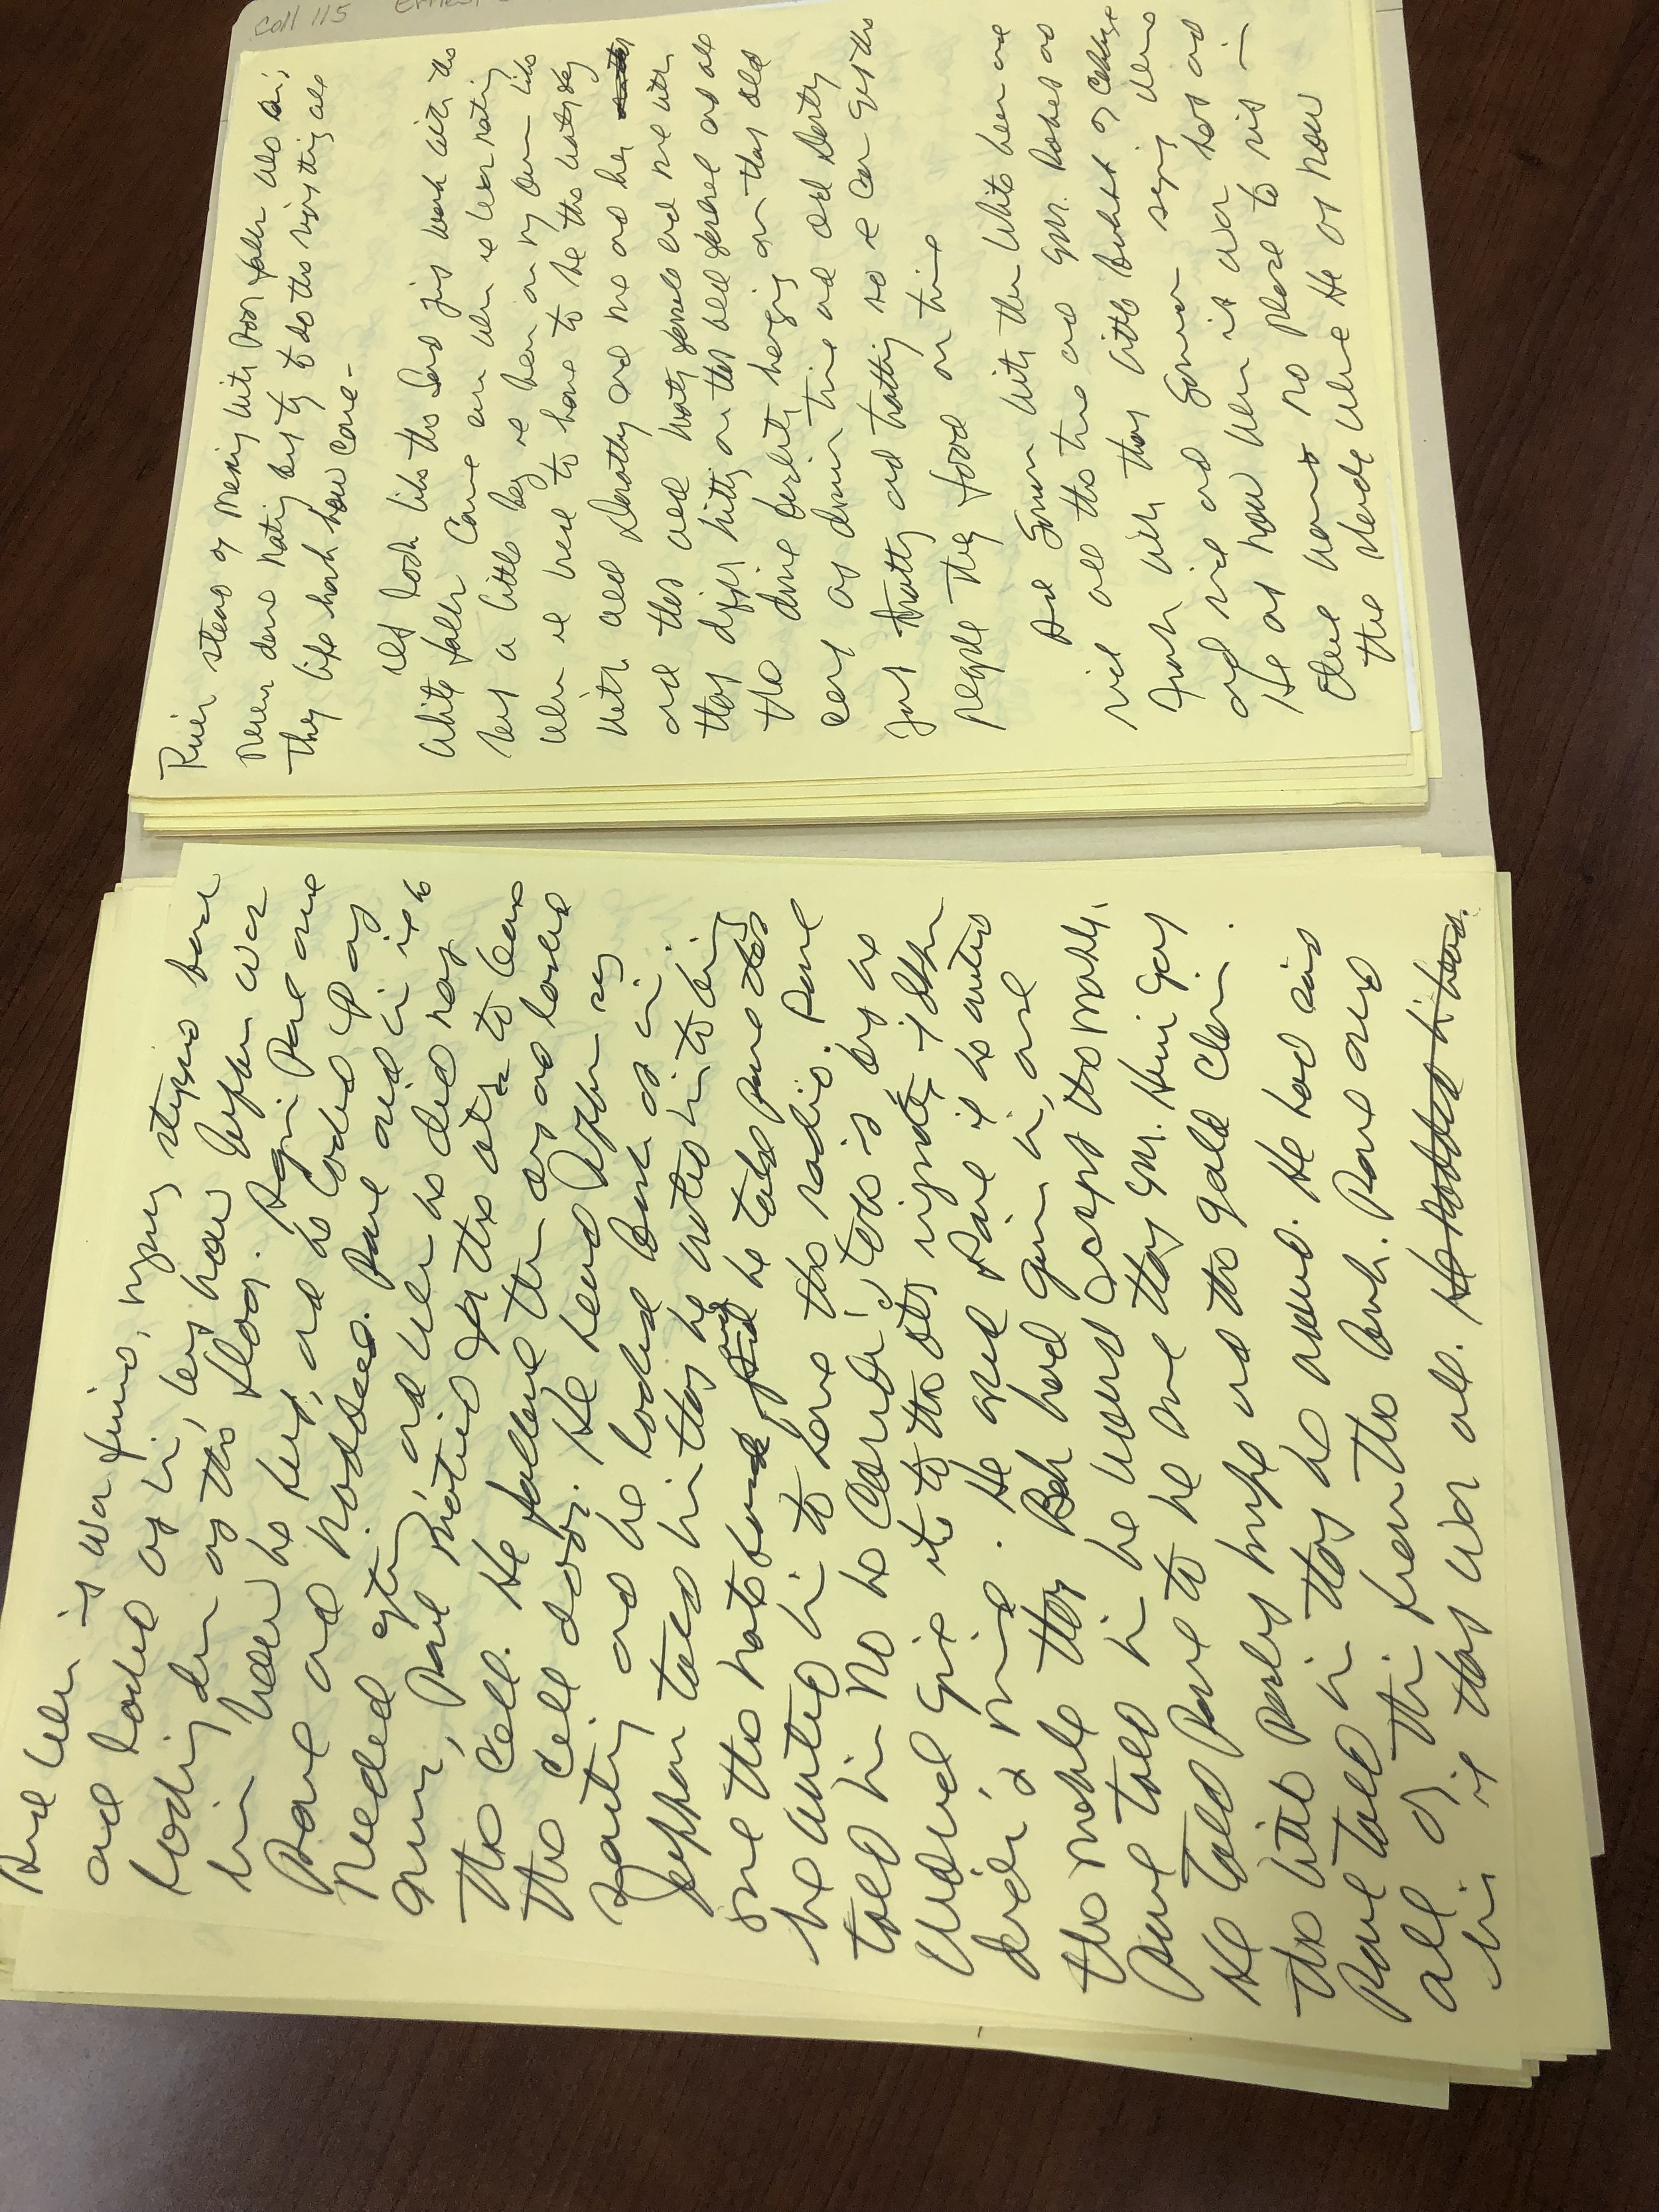 An original manuscript of Jefferson's journal entry, my favorite part of the novel